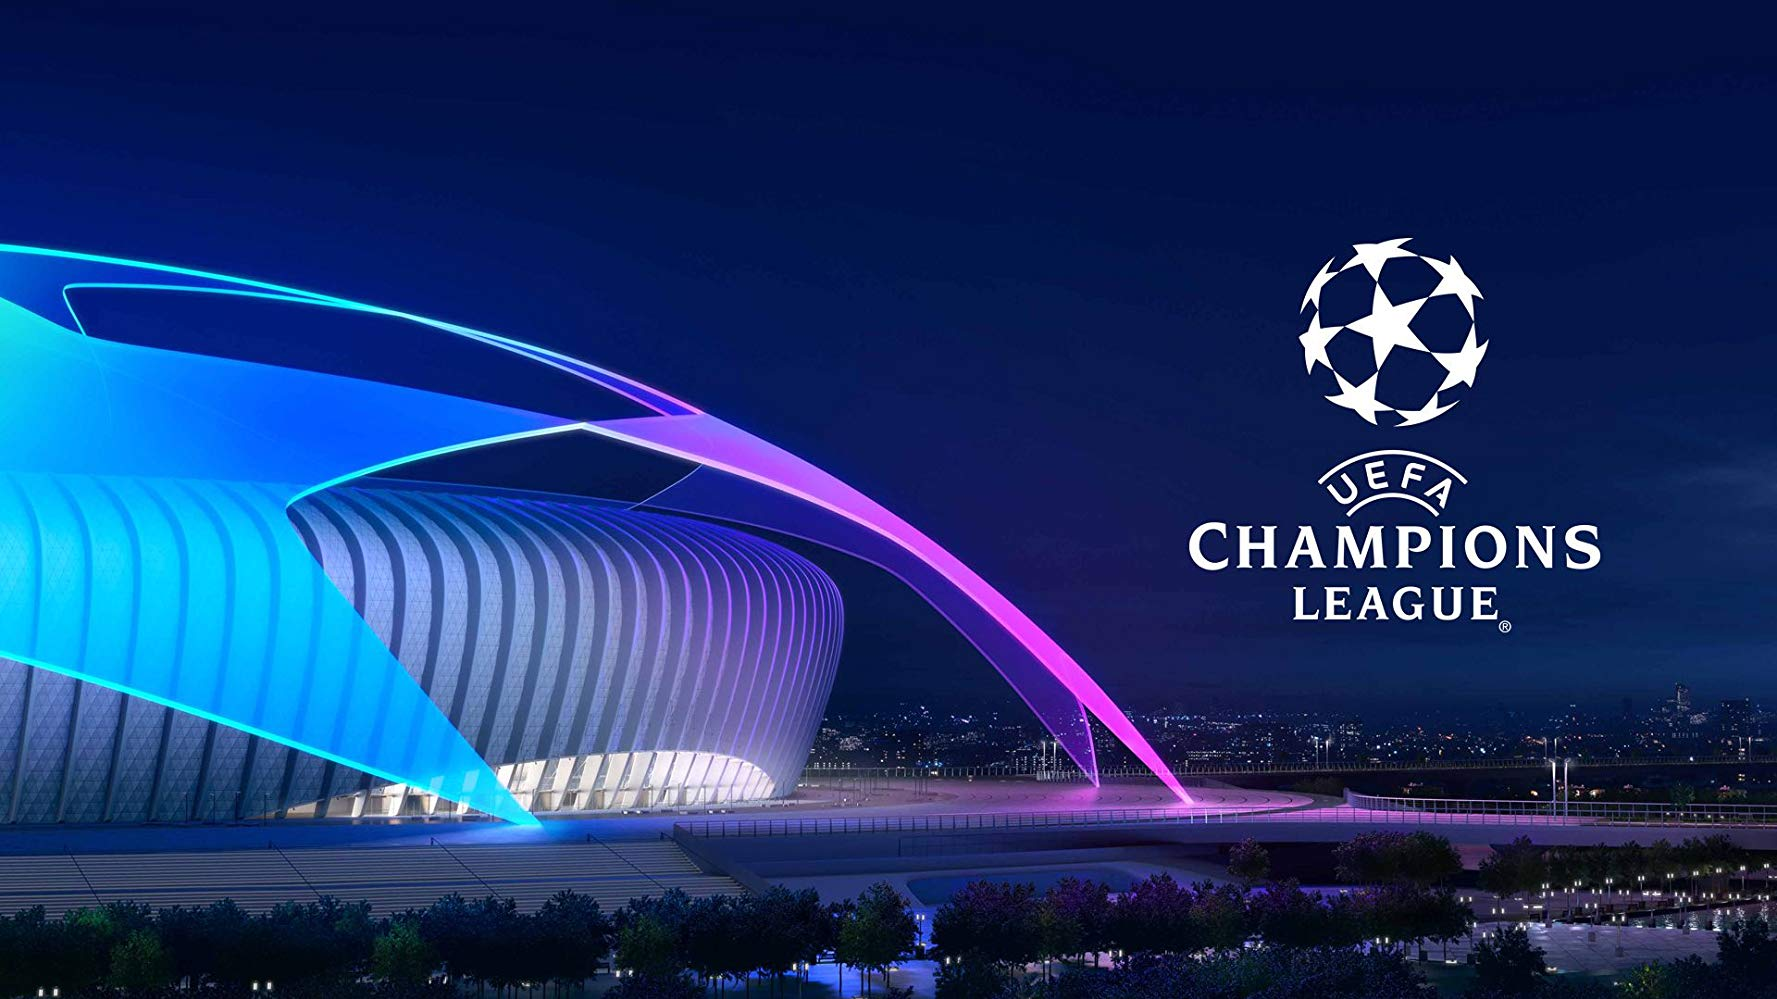 2018 2019 UEFA Champions League 2019 1777x999